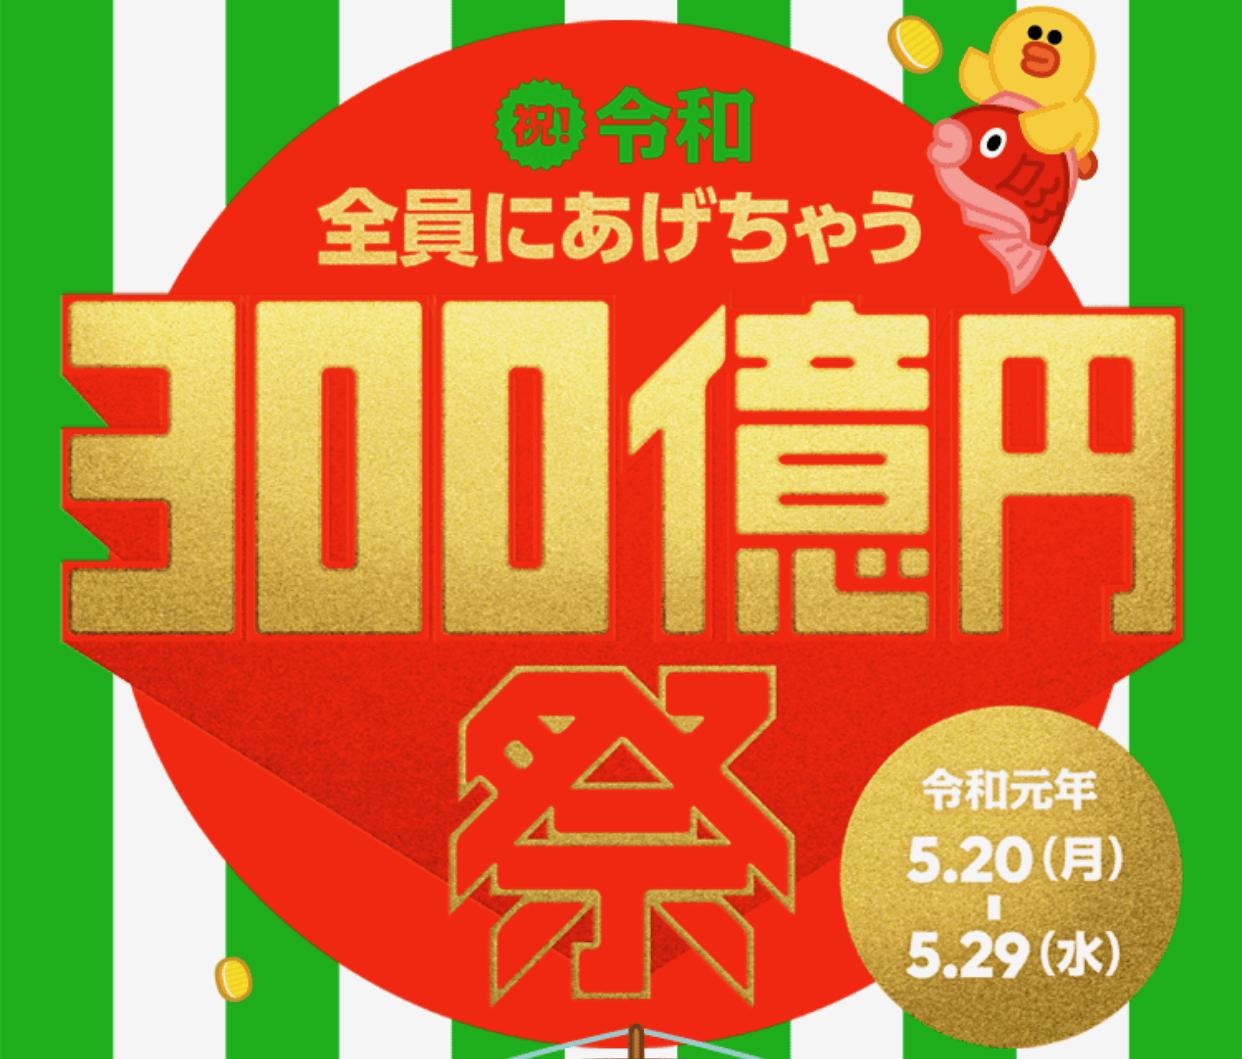 LINEPay300milionyen 01